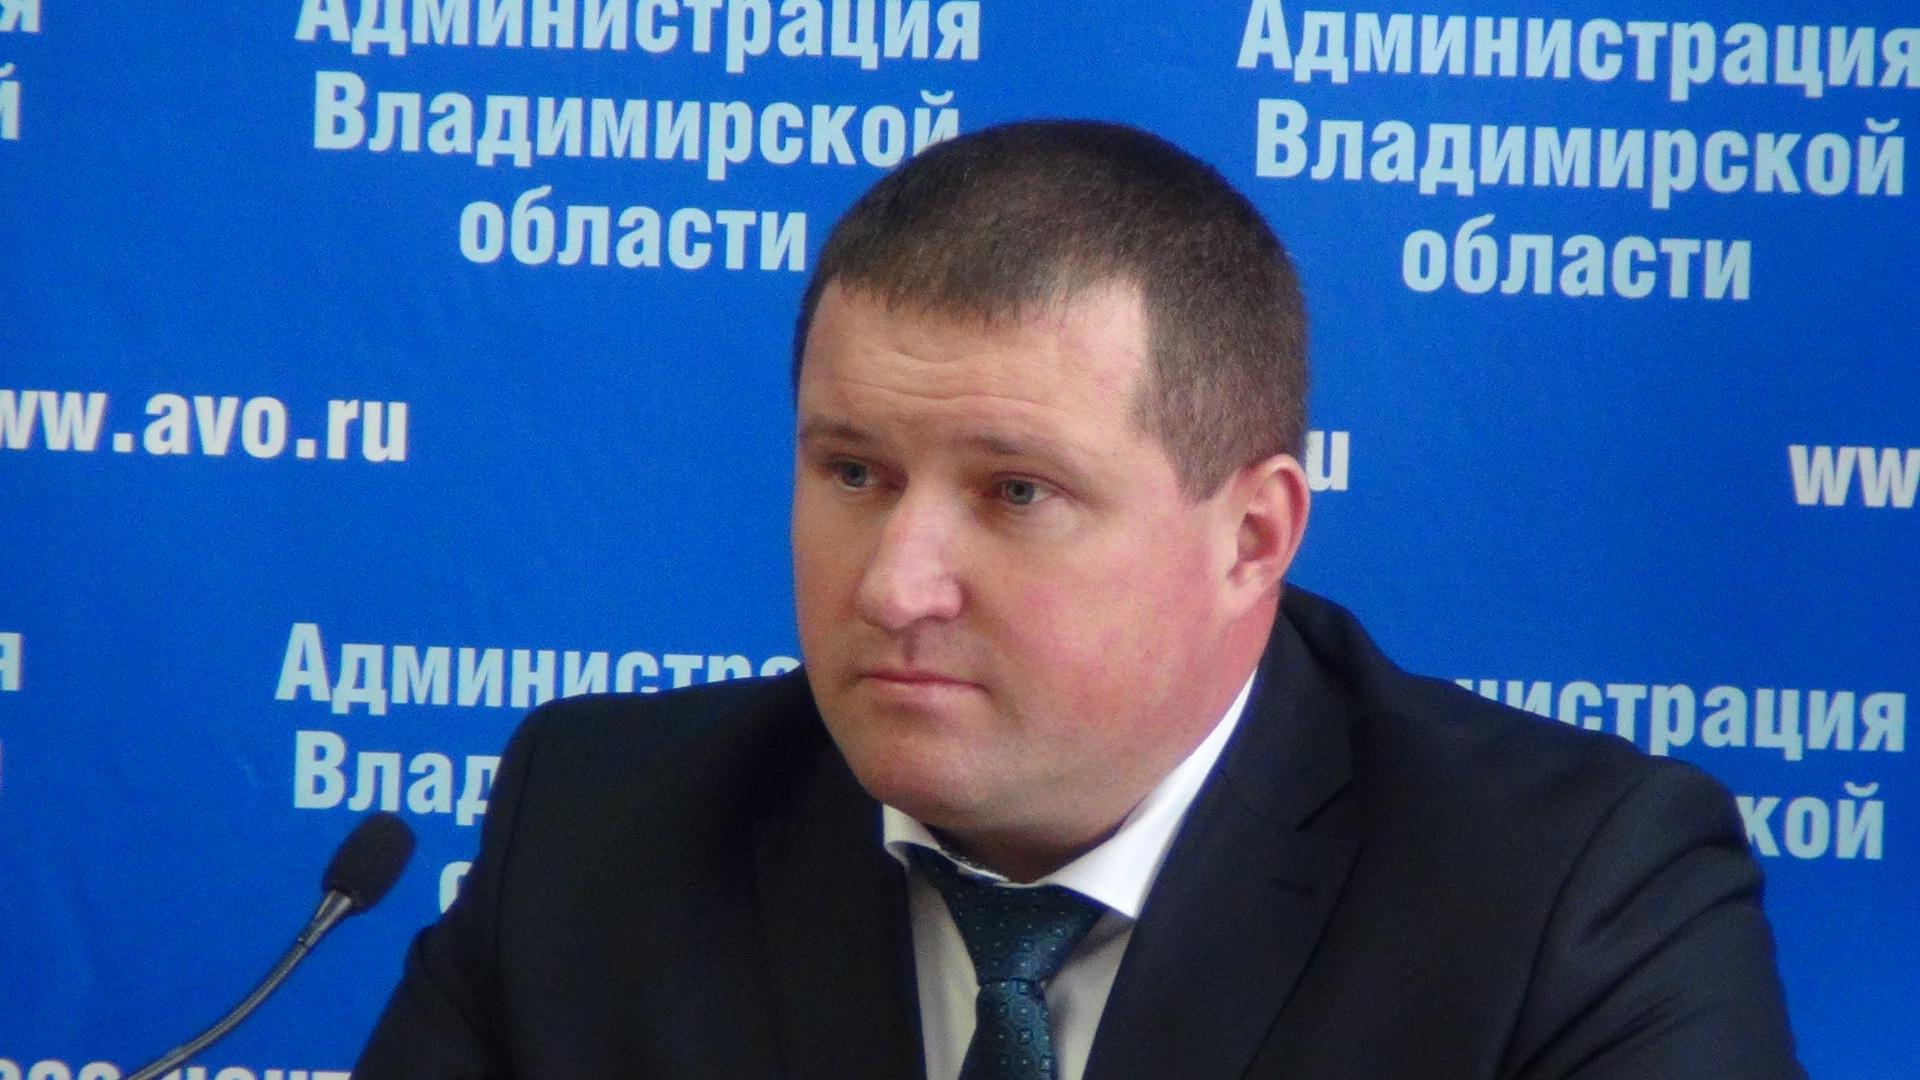 Lazovoy